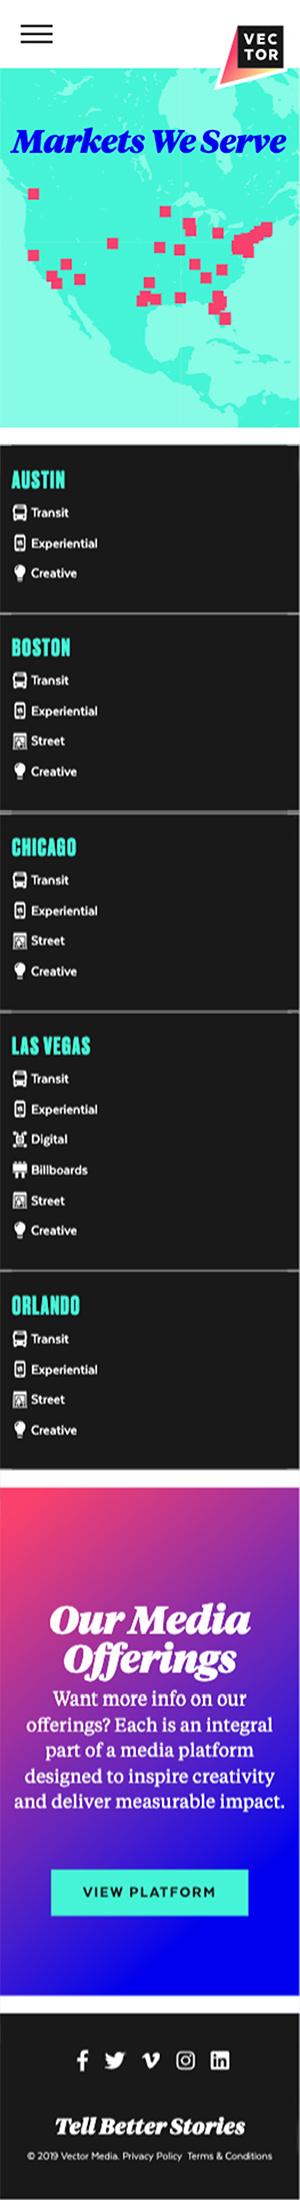 Ignyte-branding-agency-web-design-vector-media-mobile-markets-page-V3 copy